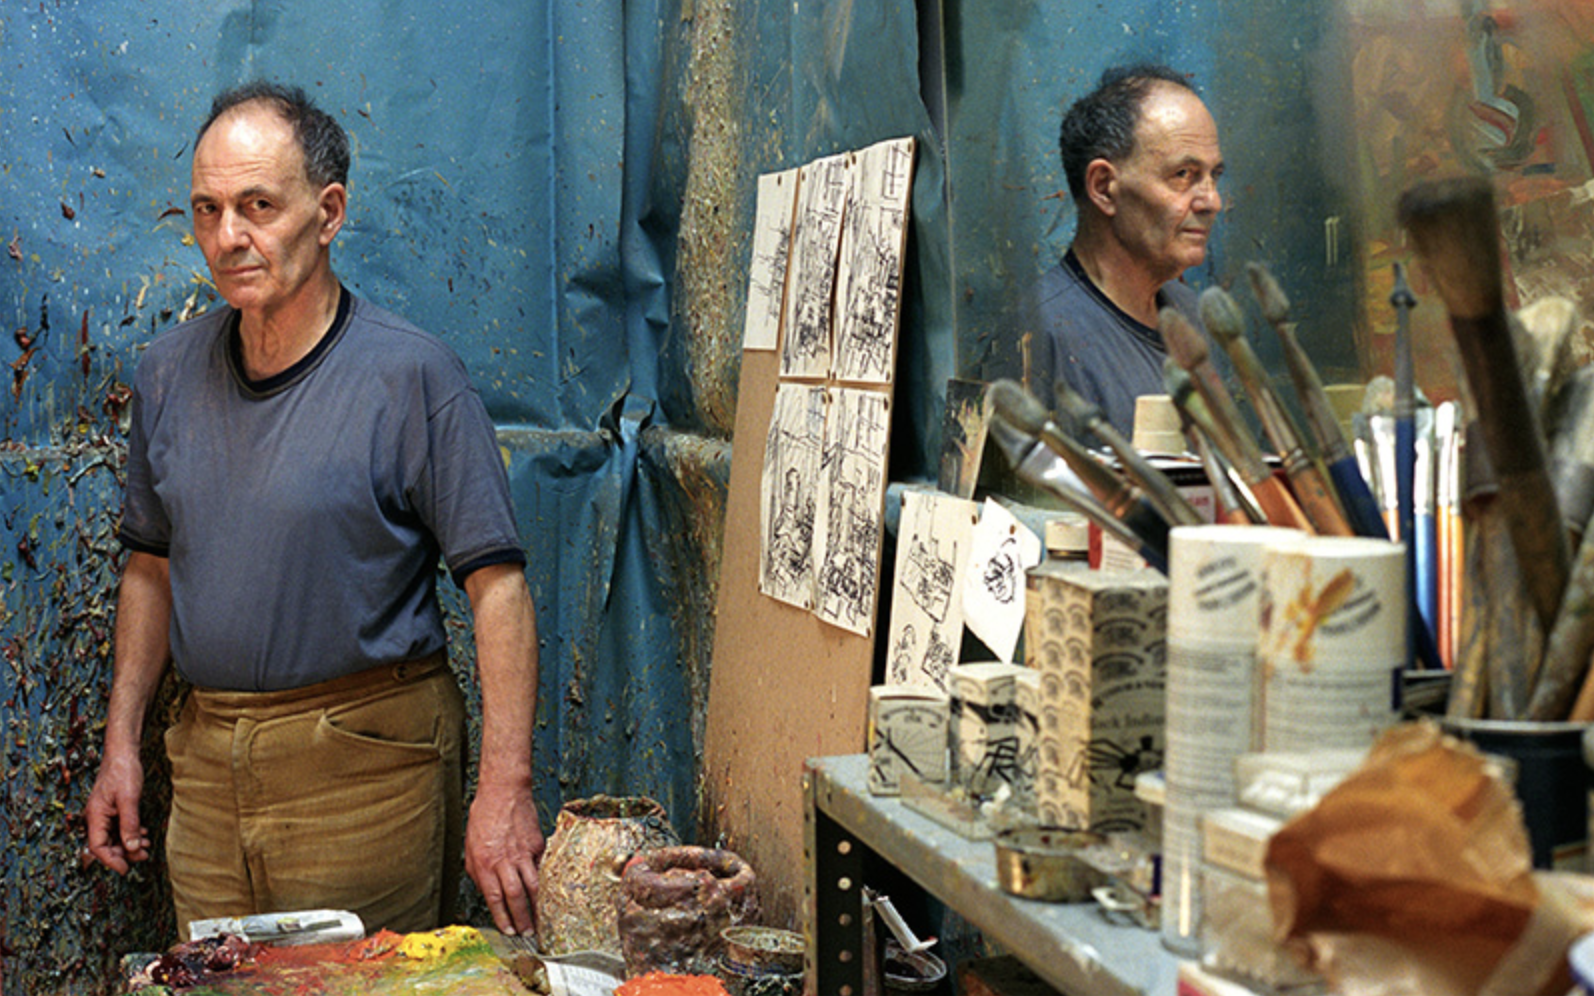 The artist Frank Auerbach in his studio.